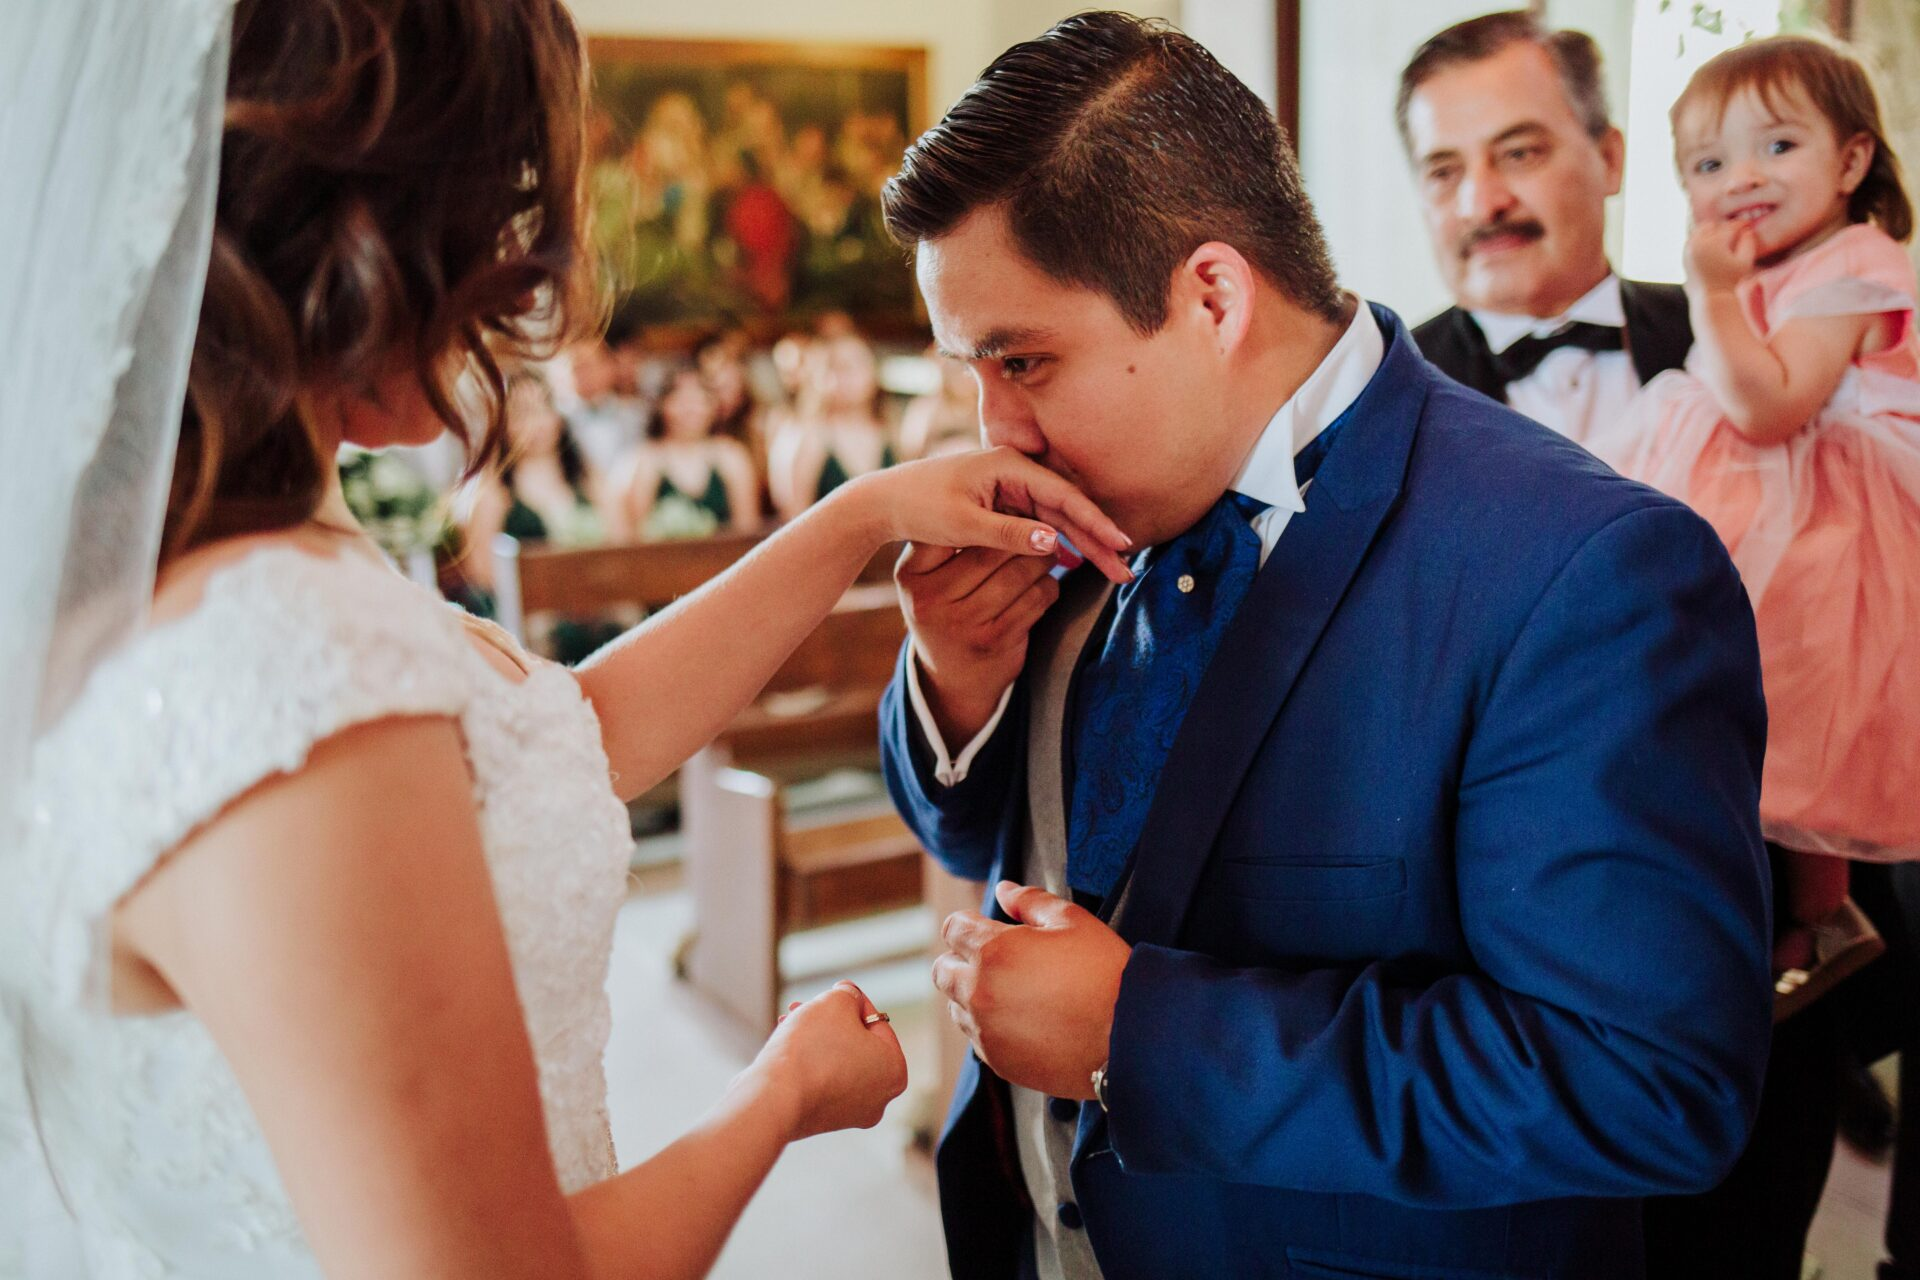 javier_noriega_fotografo_bodas_torreon_coahuila_zacatecas_wedding_photographer32a